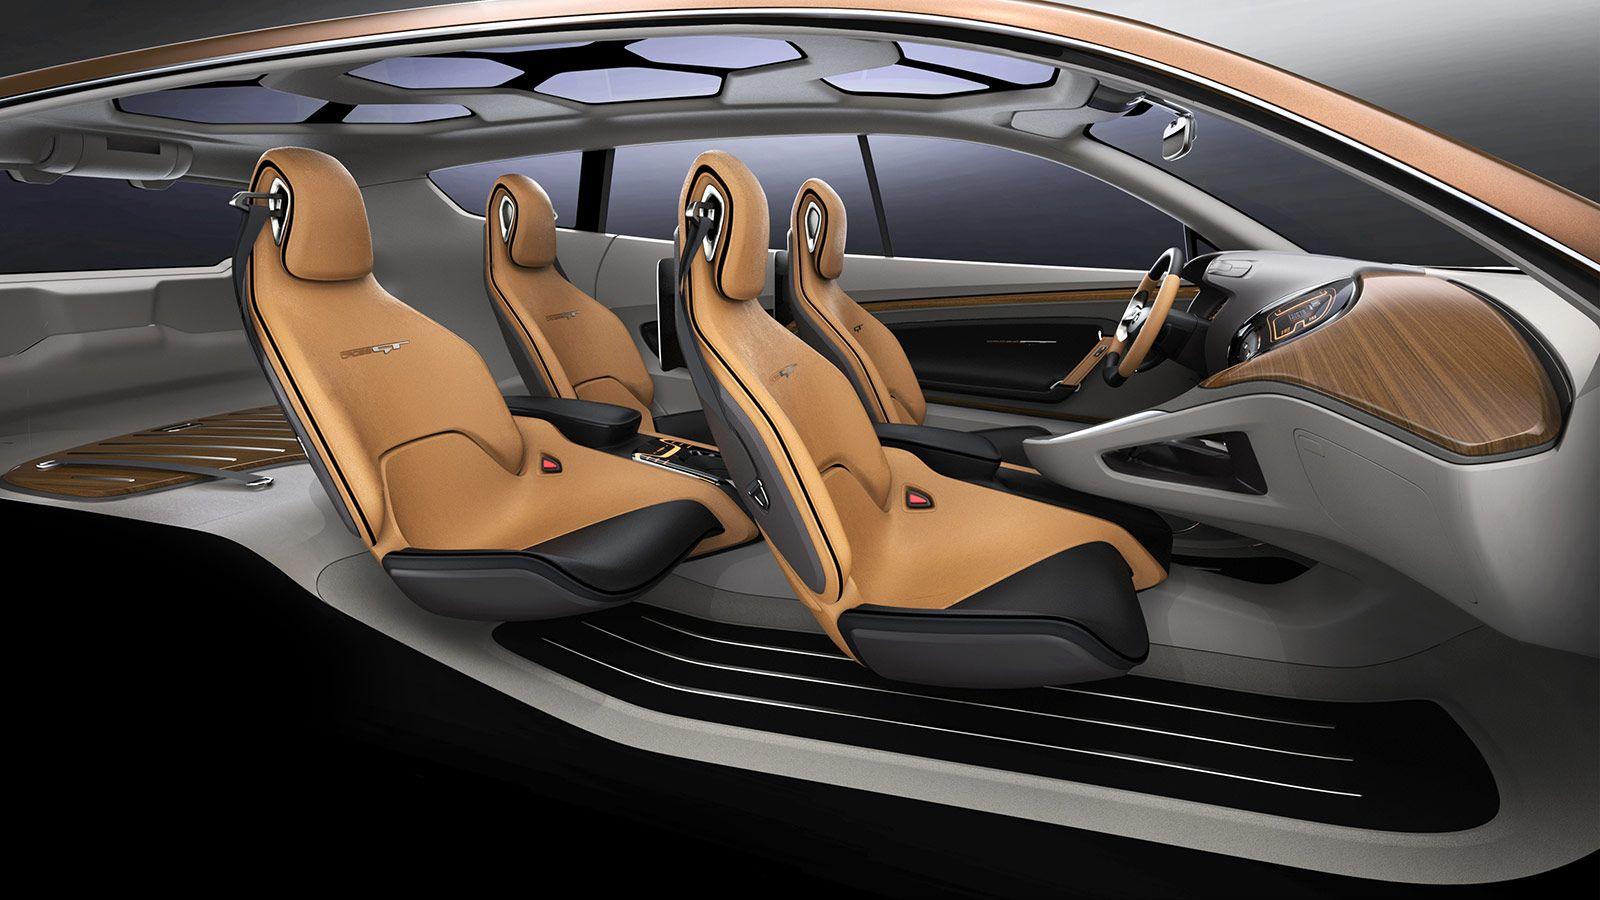 kia cross gt concept interior   cars& motorcycles   pinterest